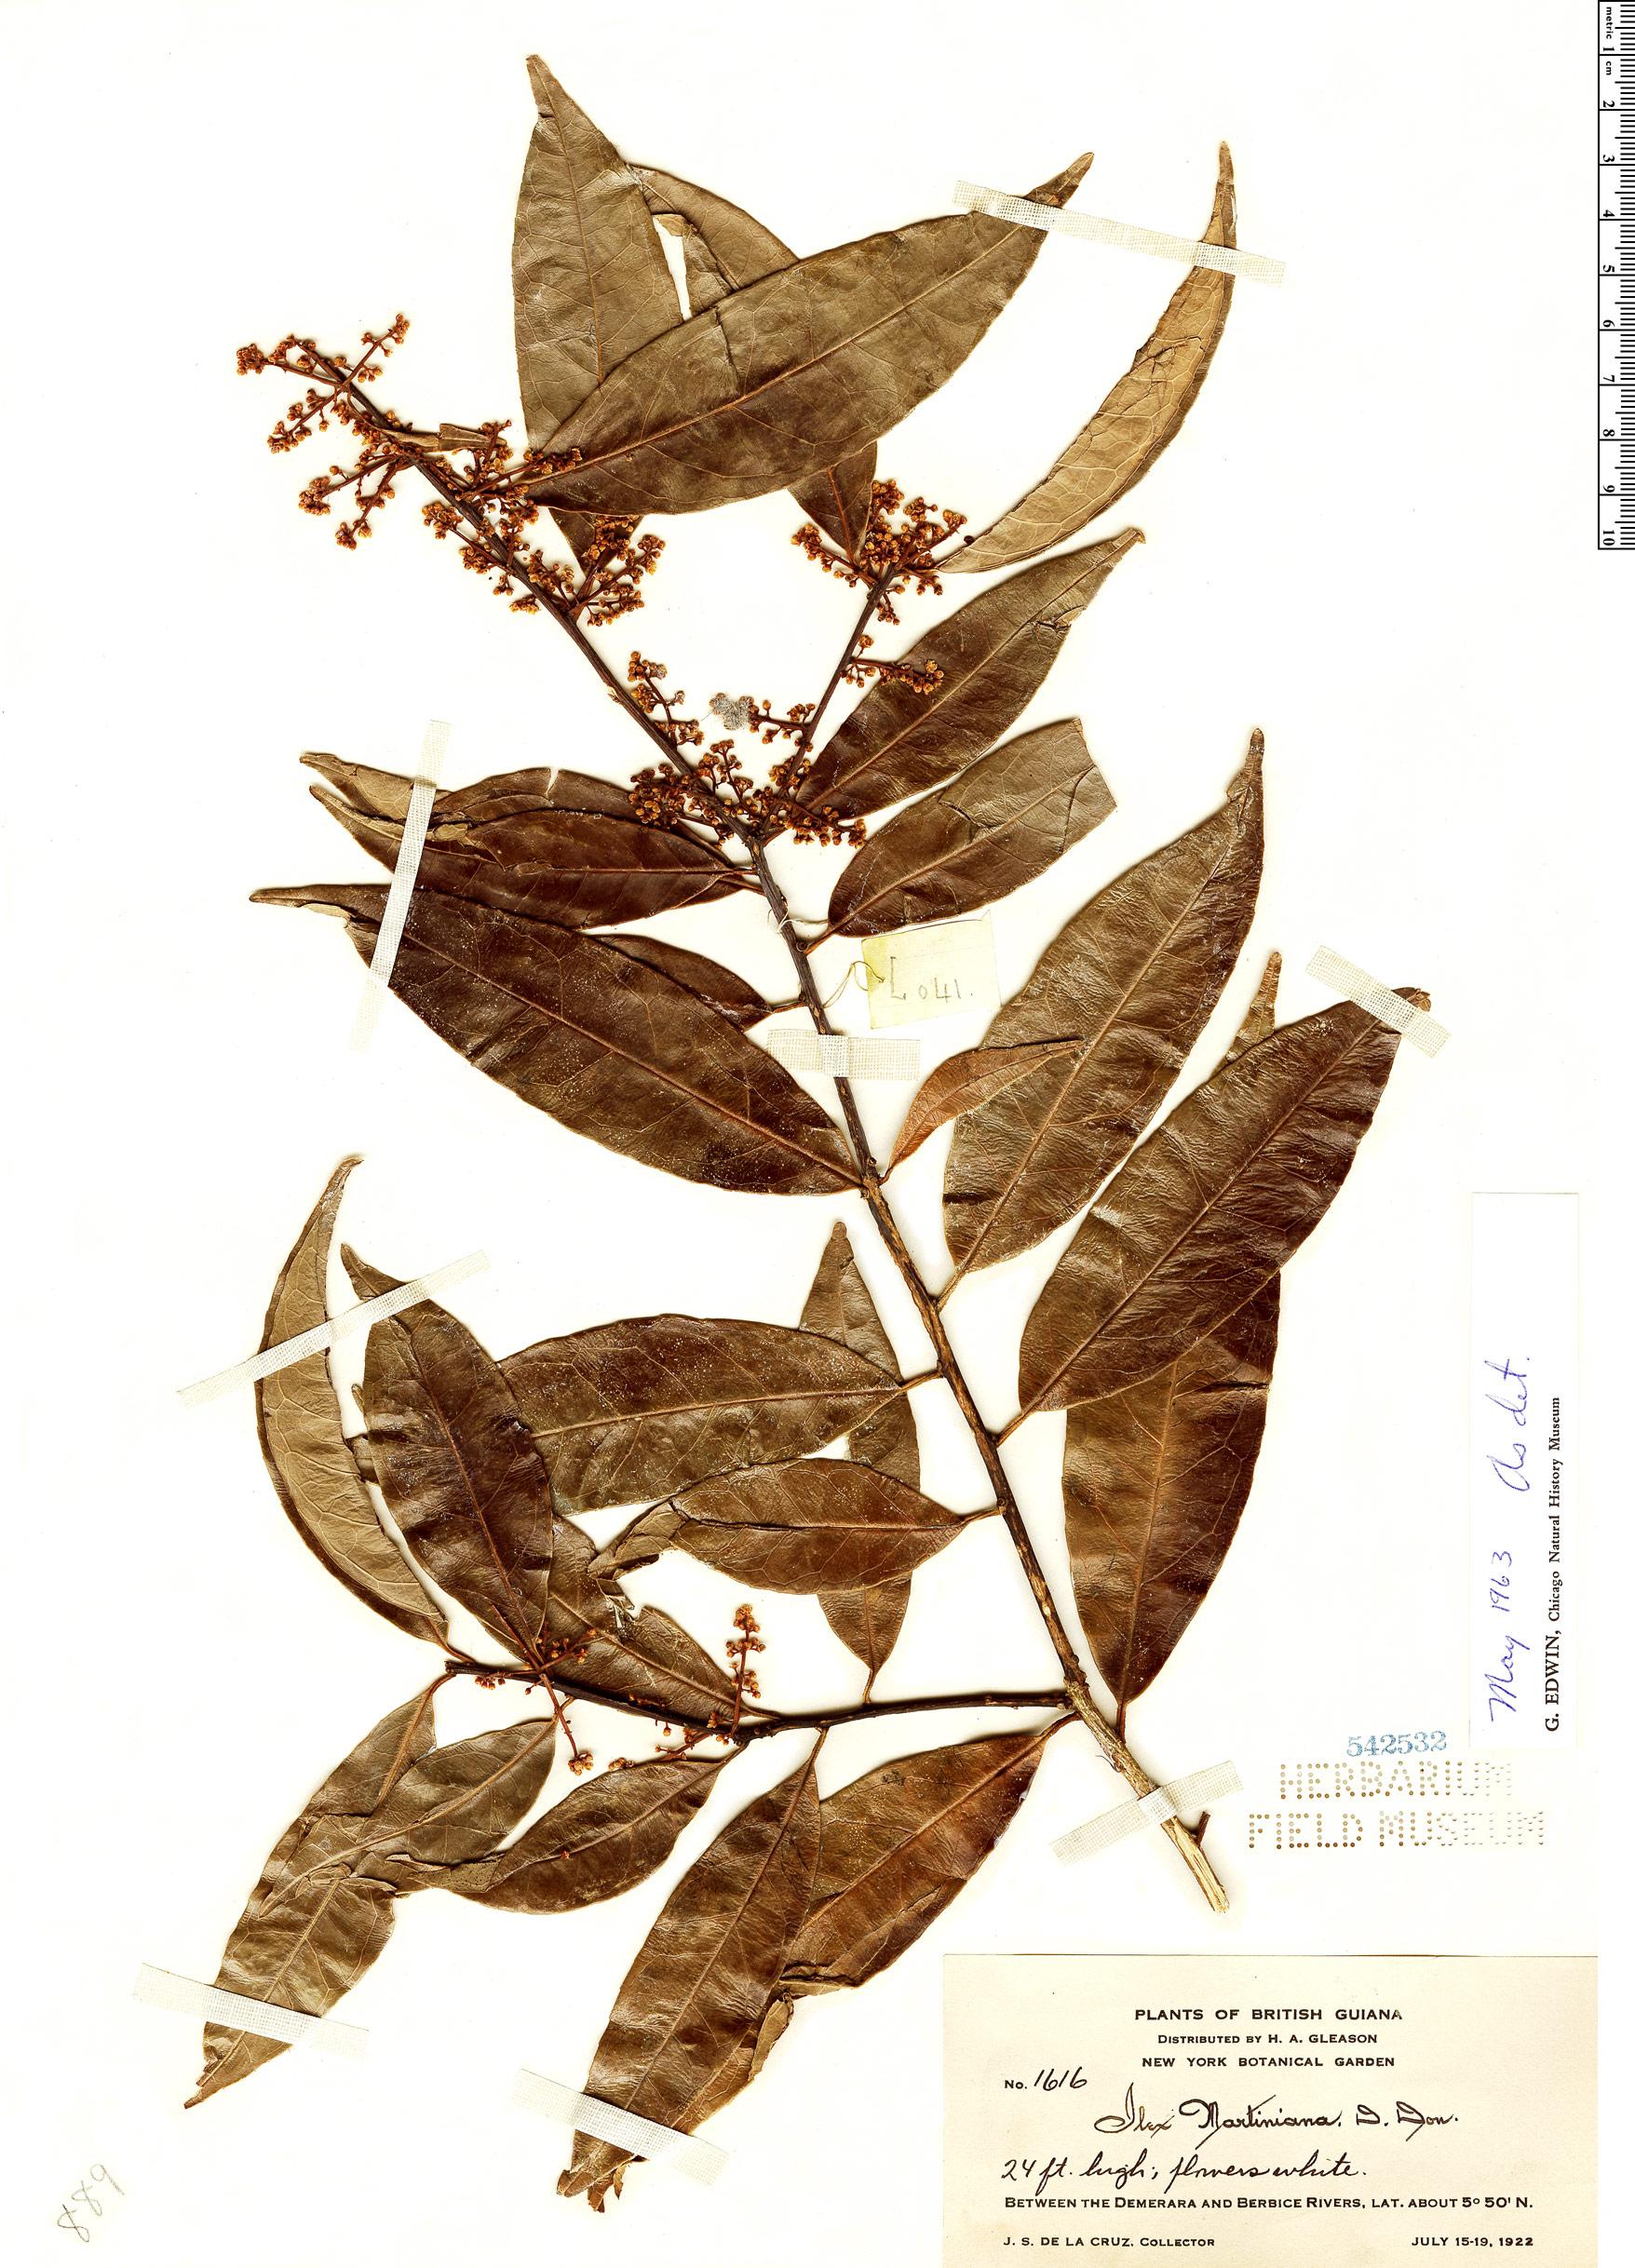 Specimen: Ilex martiniana